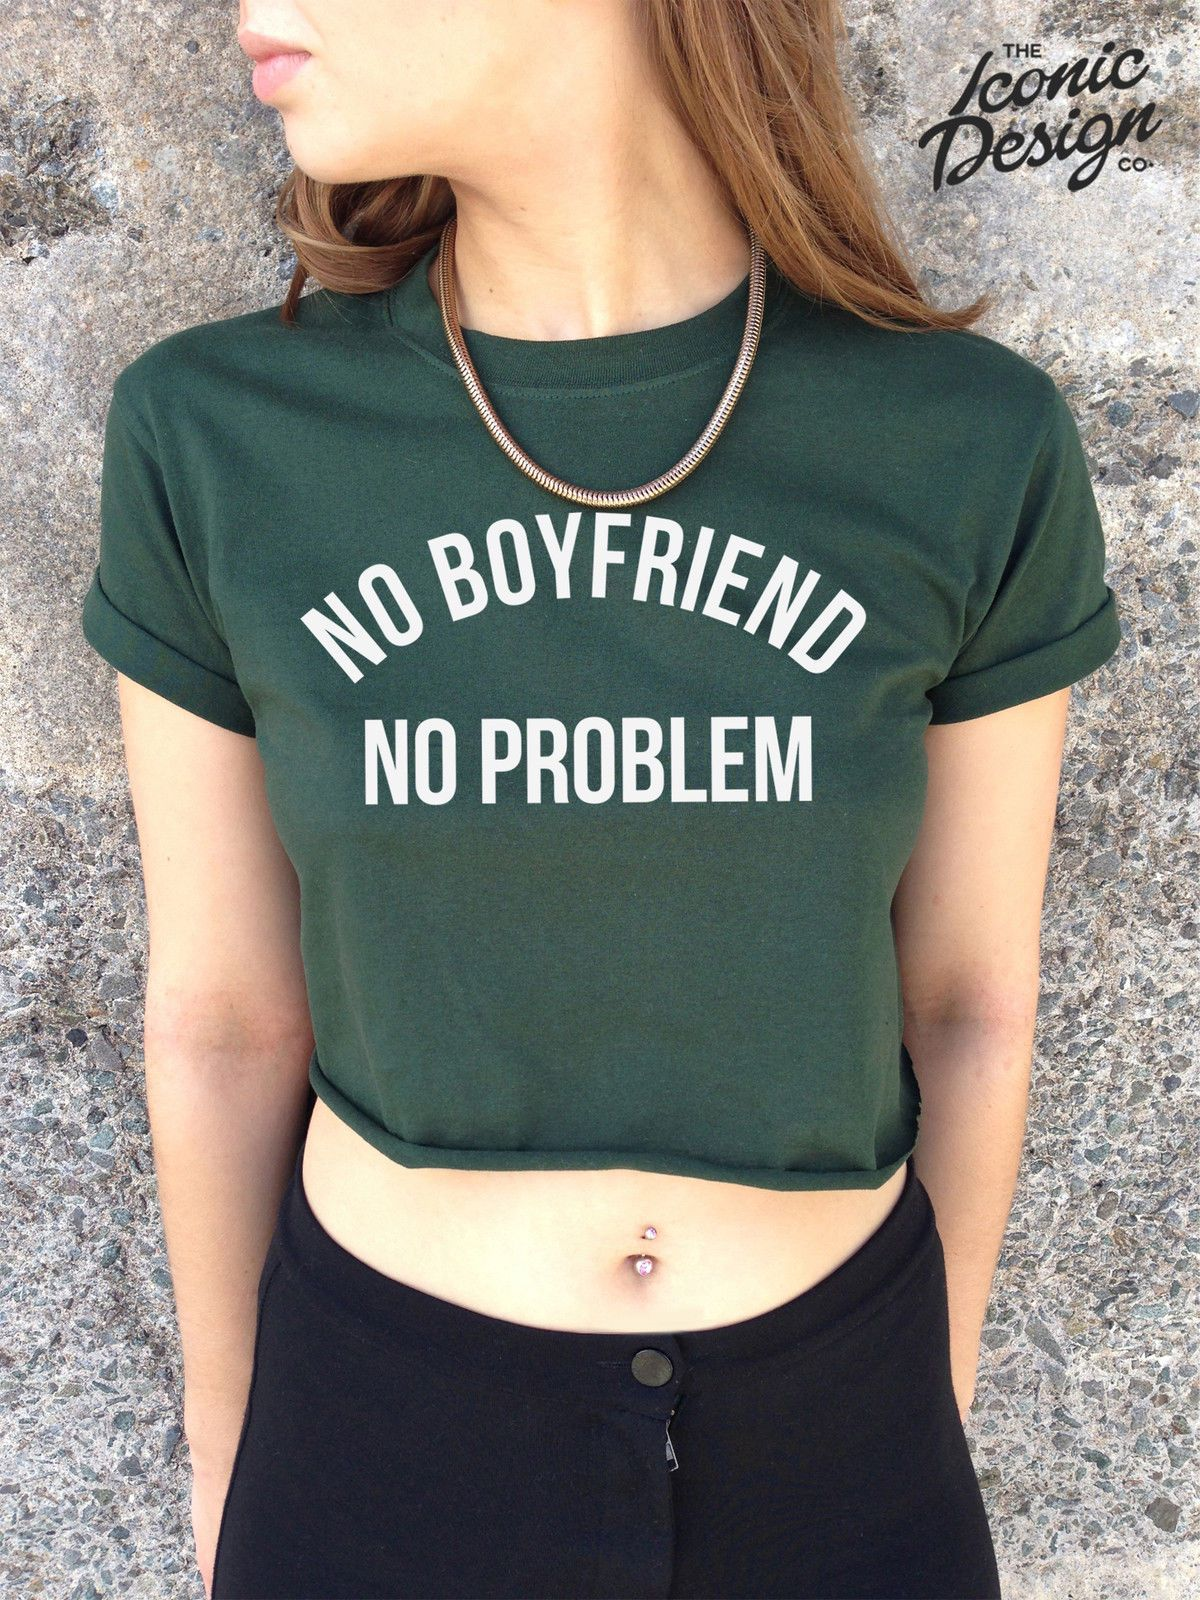 a450eda167 No Boyfriend No Problem Crop Top Tank Tumblr Cropped Hype Homies Problem s